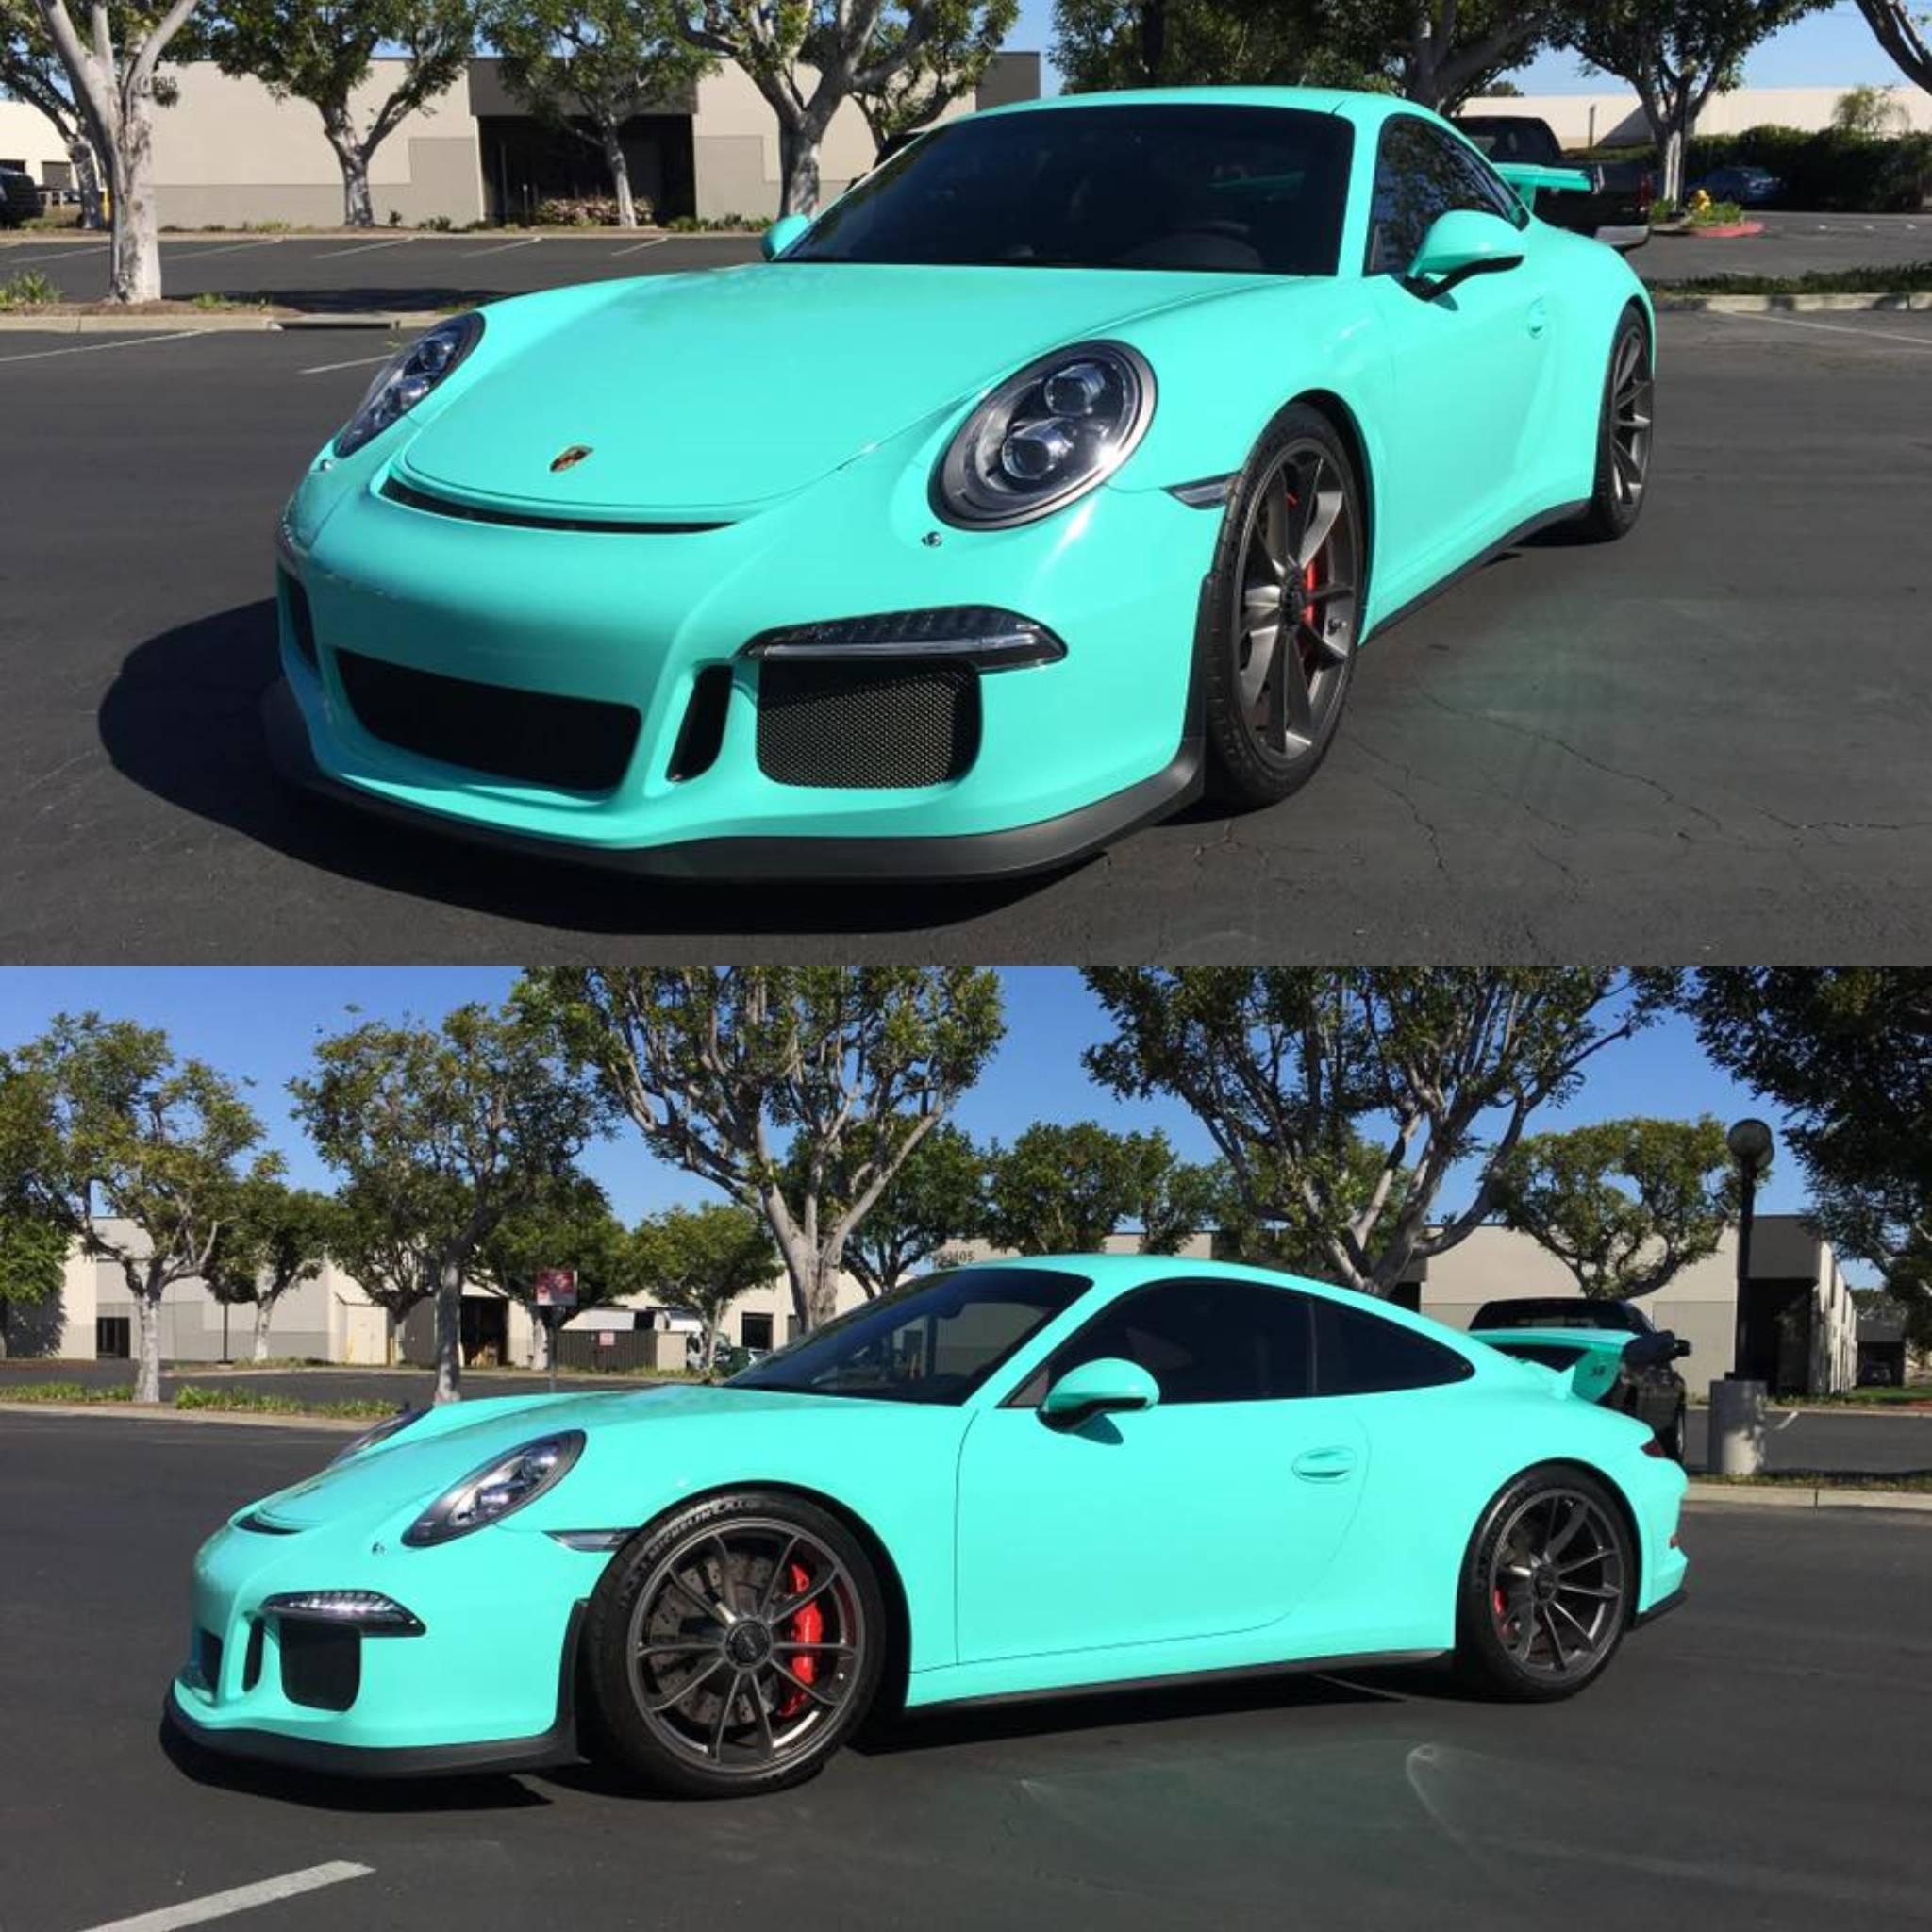 Porsche 911 Car: Epic Tiffany Blue Wrapped Porsche 911 GT3